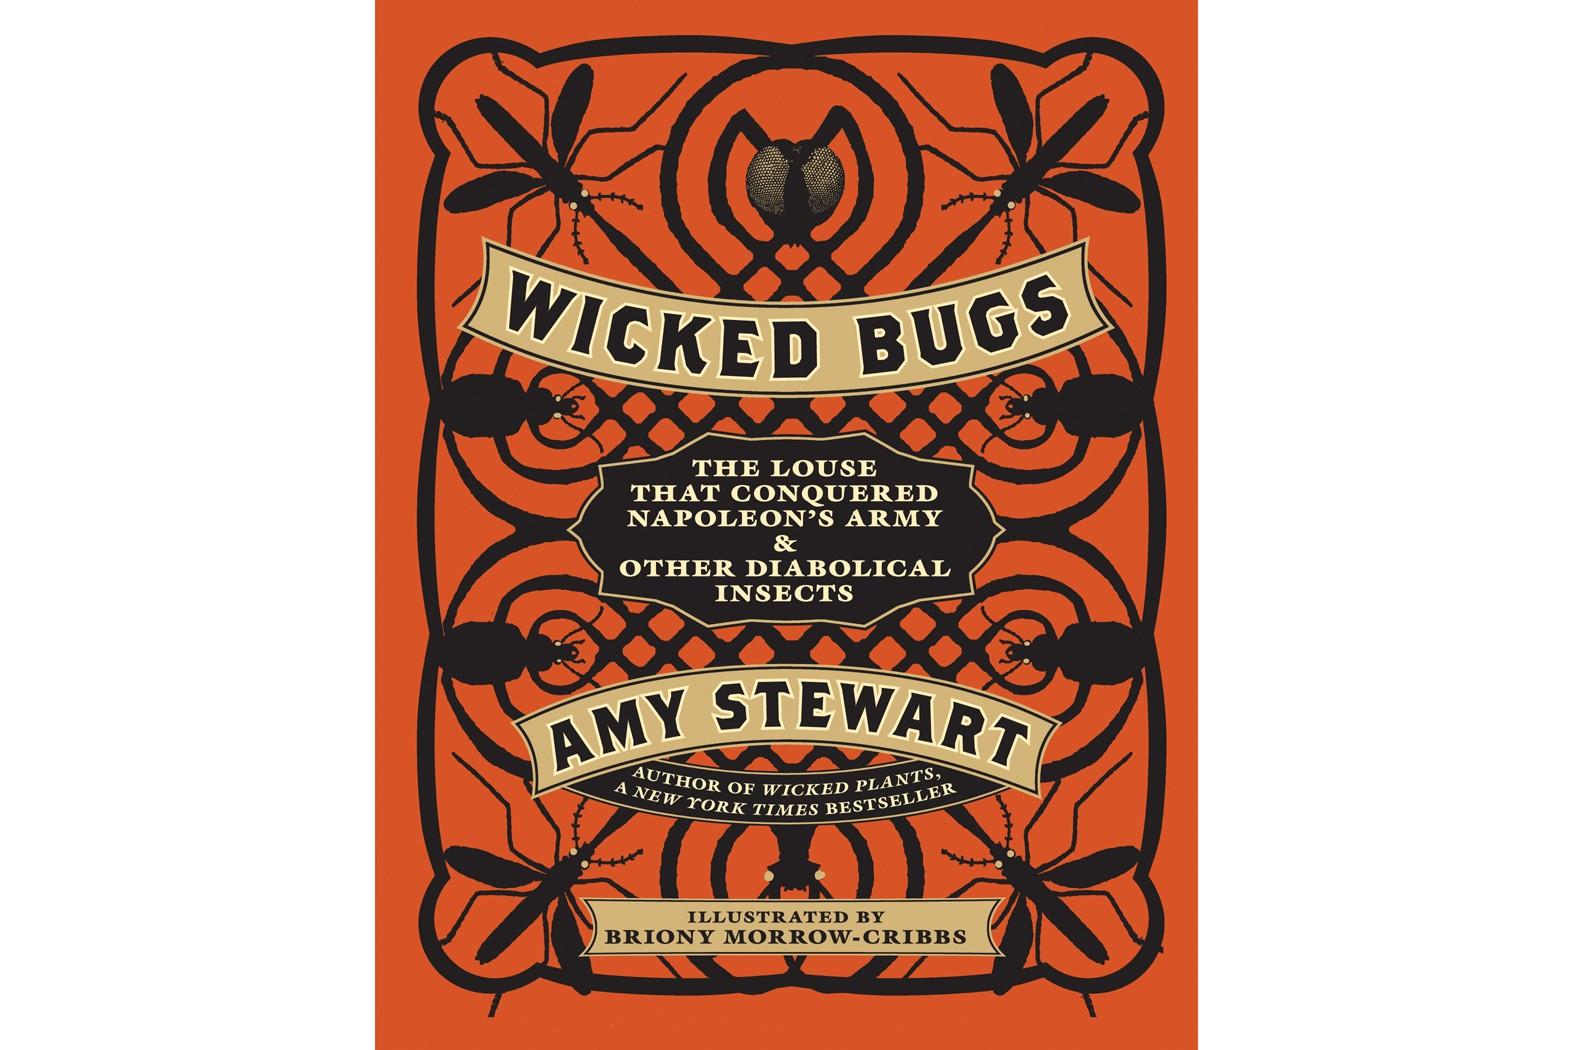 wickedbugs.jpg